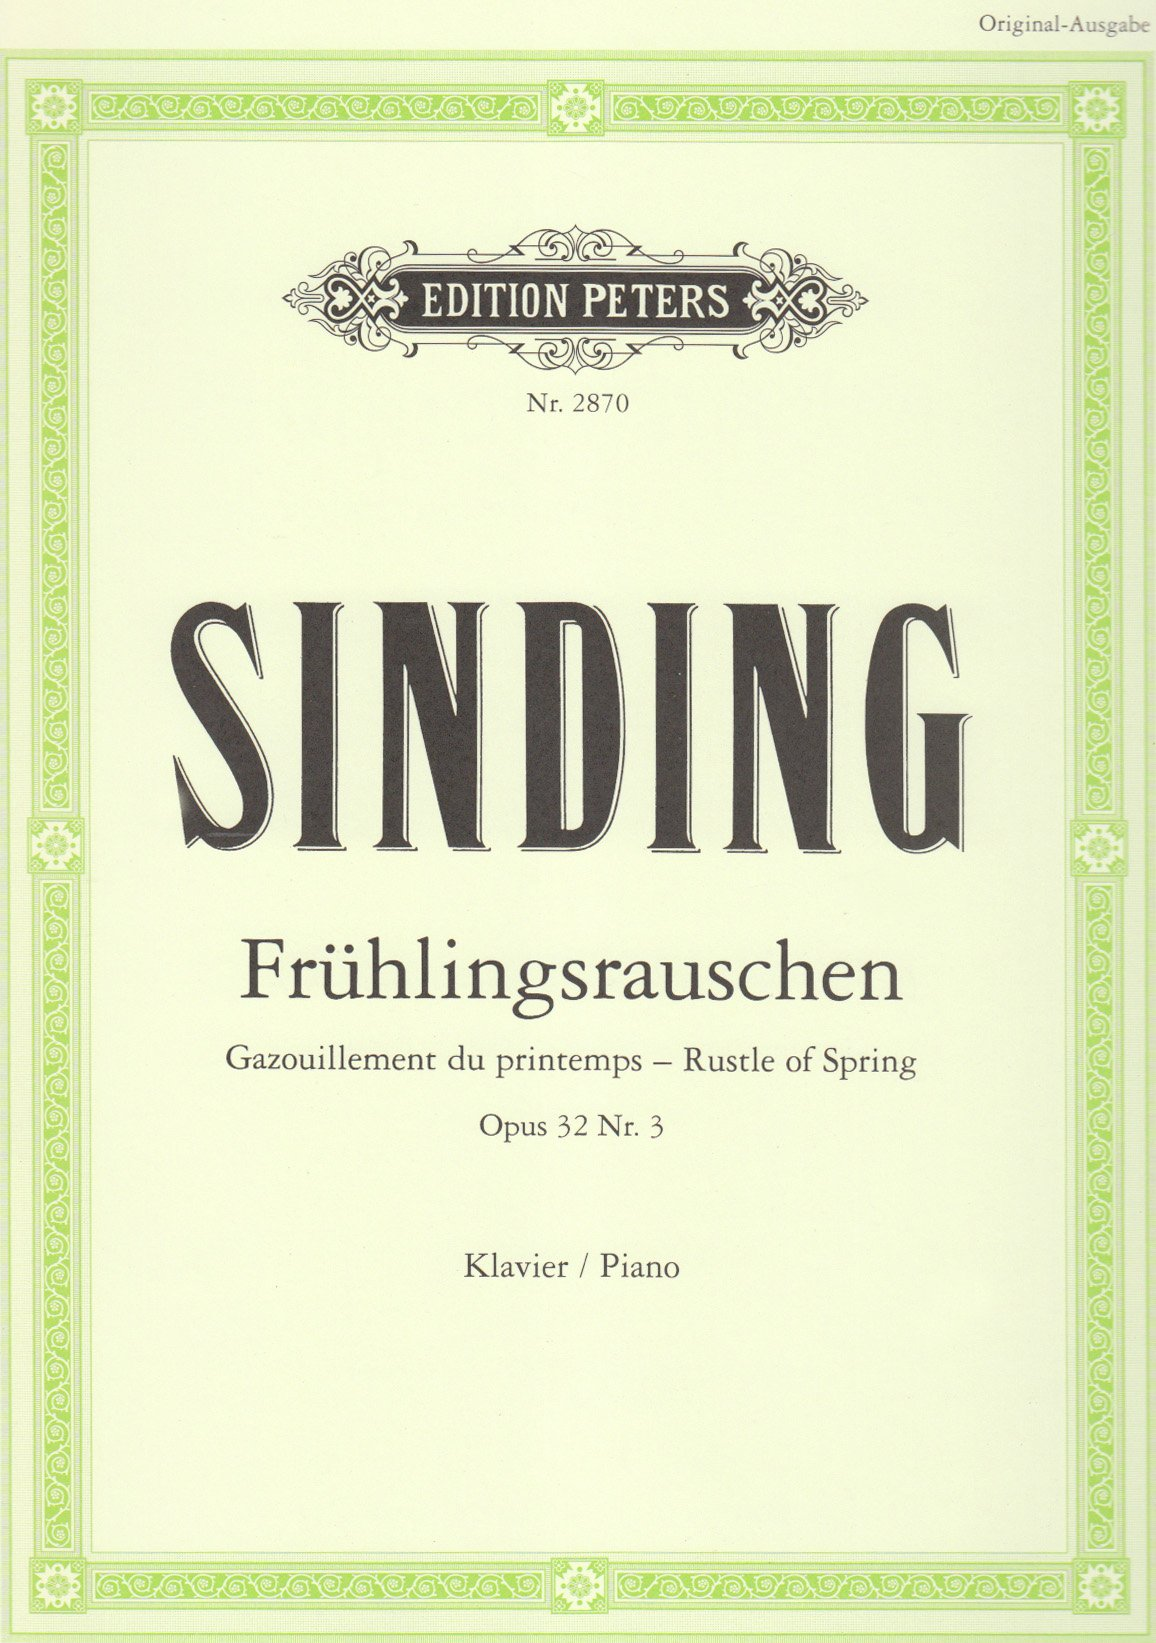 Frühlingsrauschen op. 32 Nr. 3: Gazouillement du printemps - Rustle of Spring. Klavier / Piano